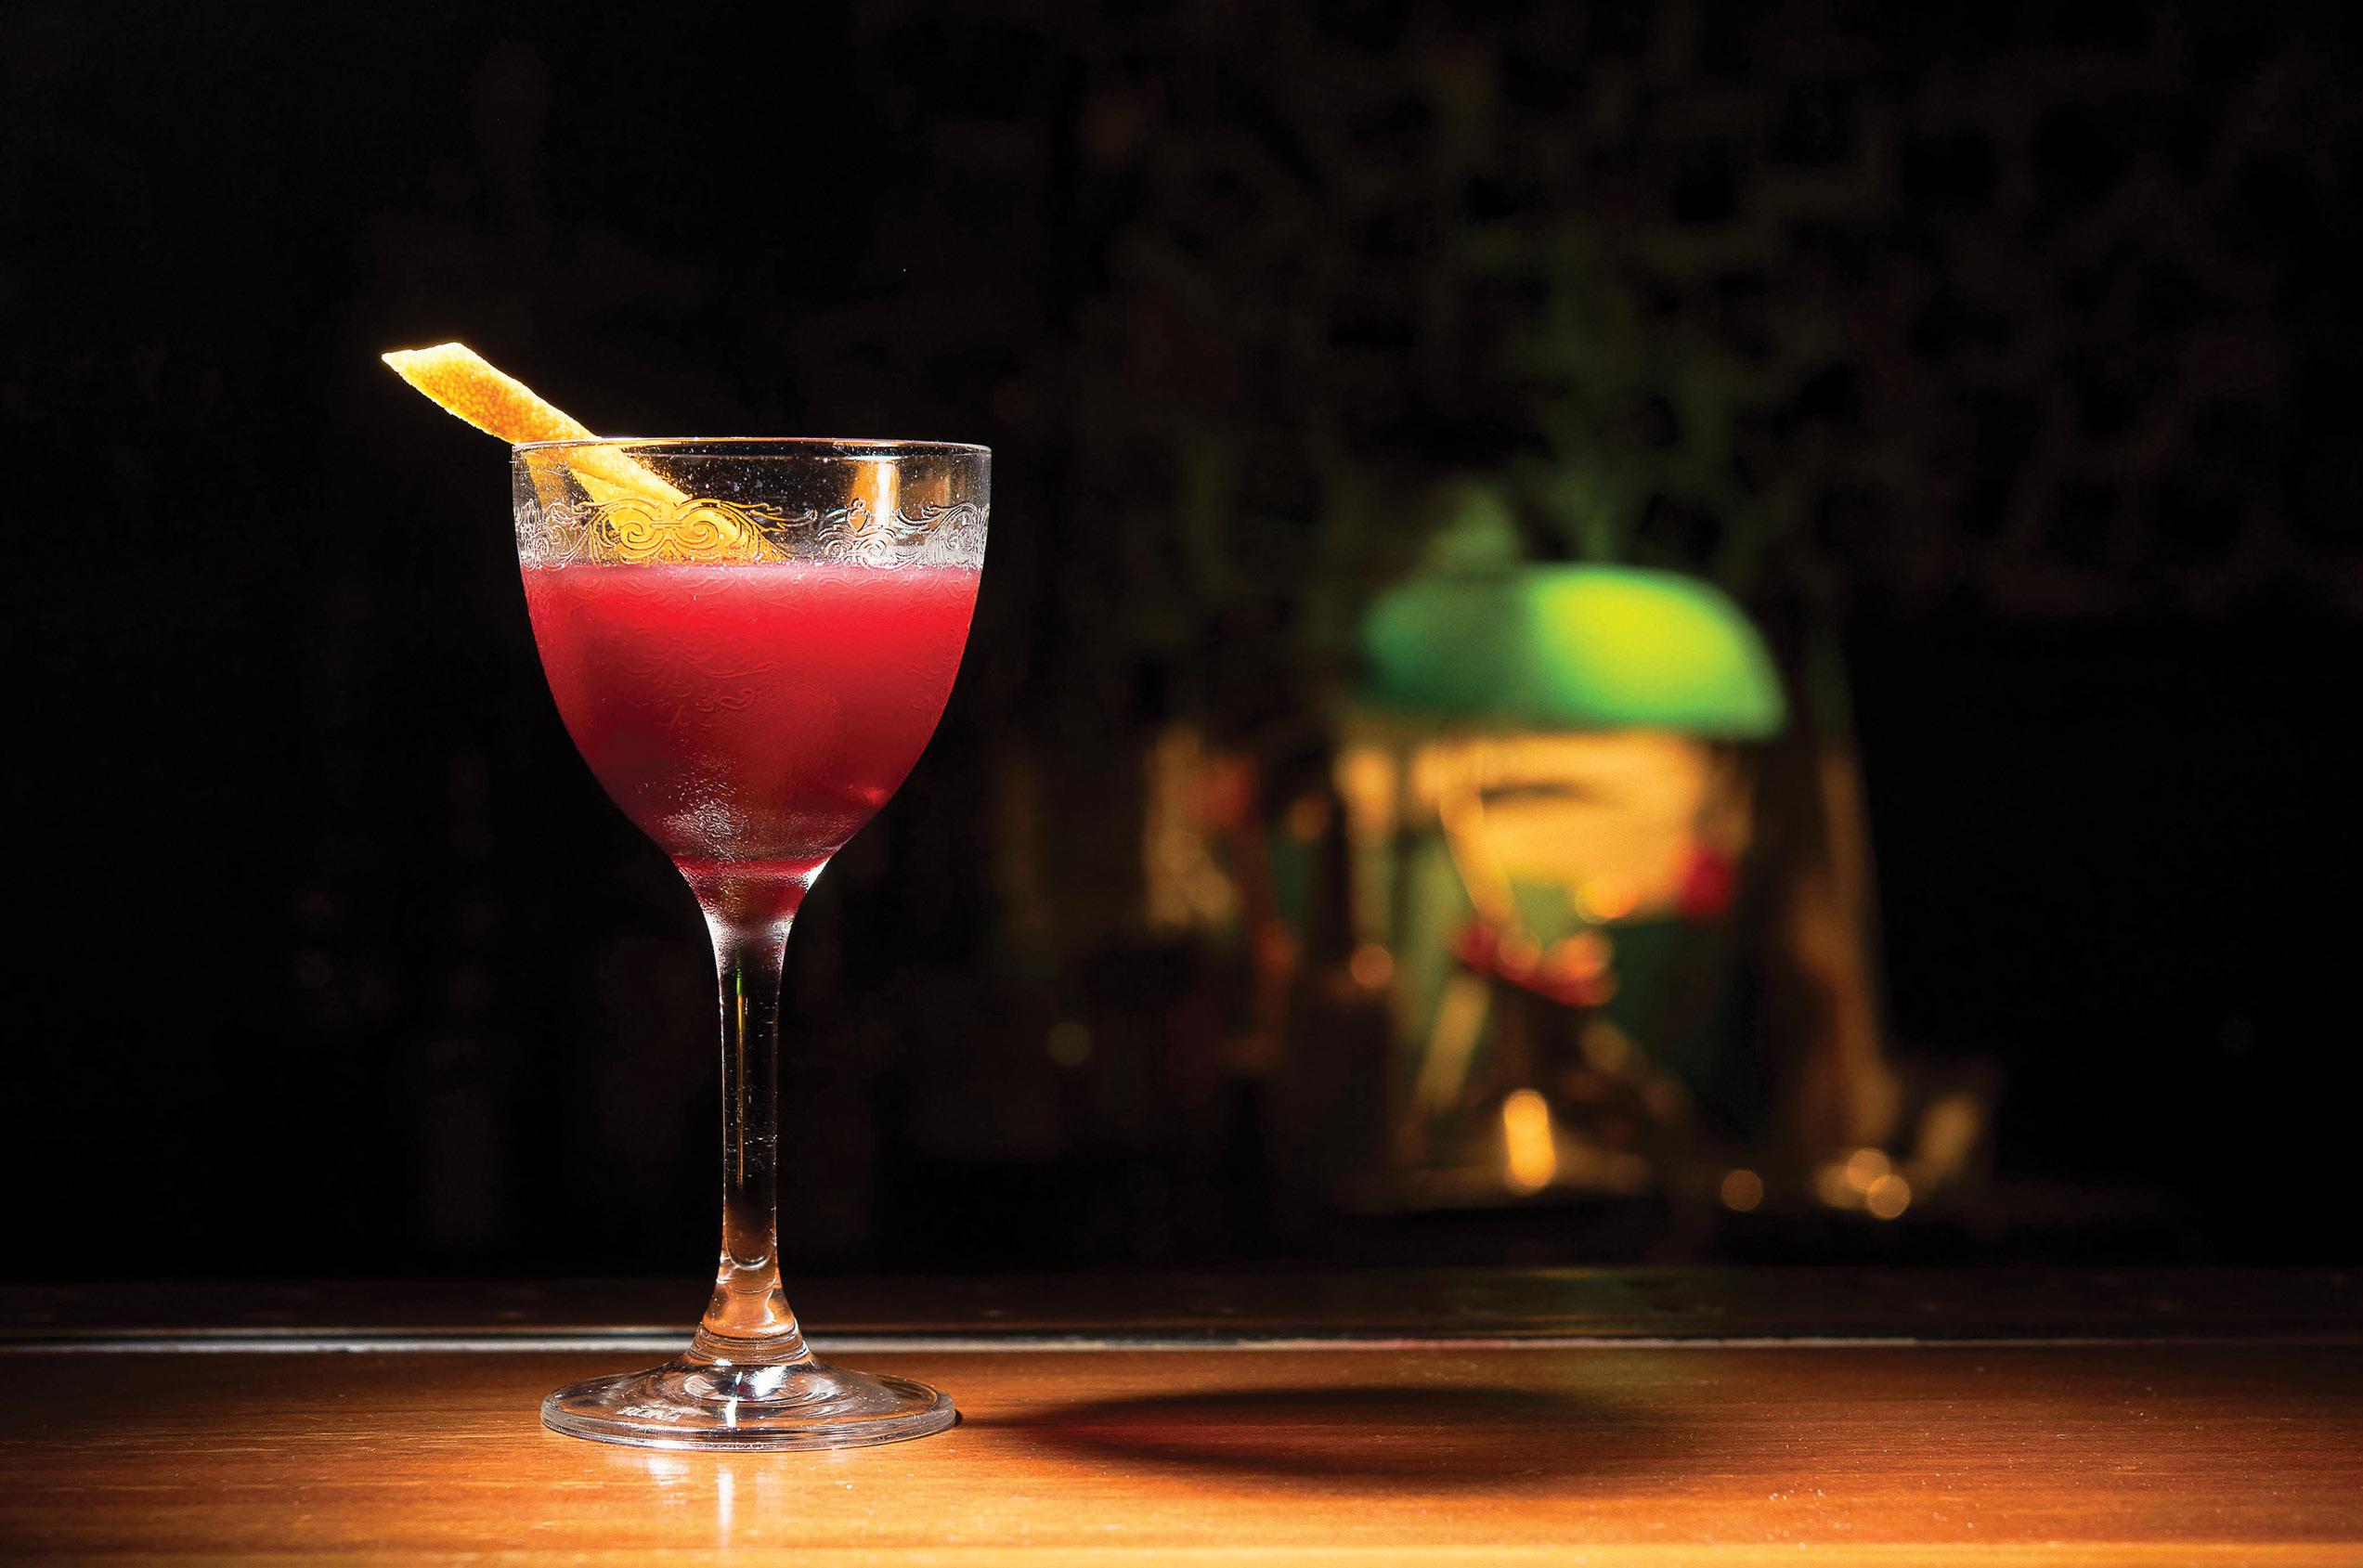 Chancellor cocktail